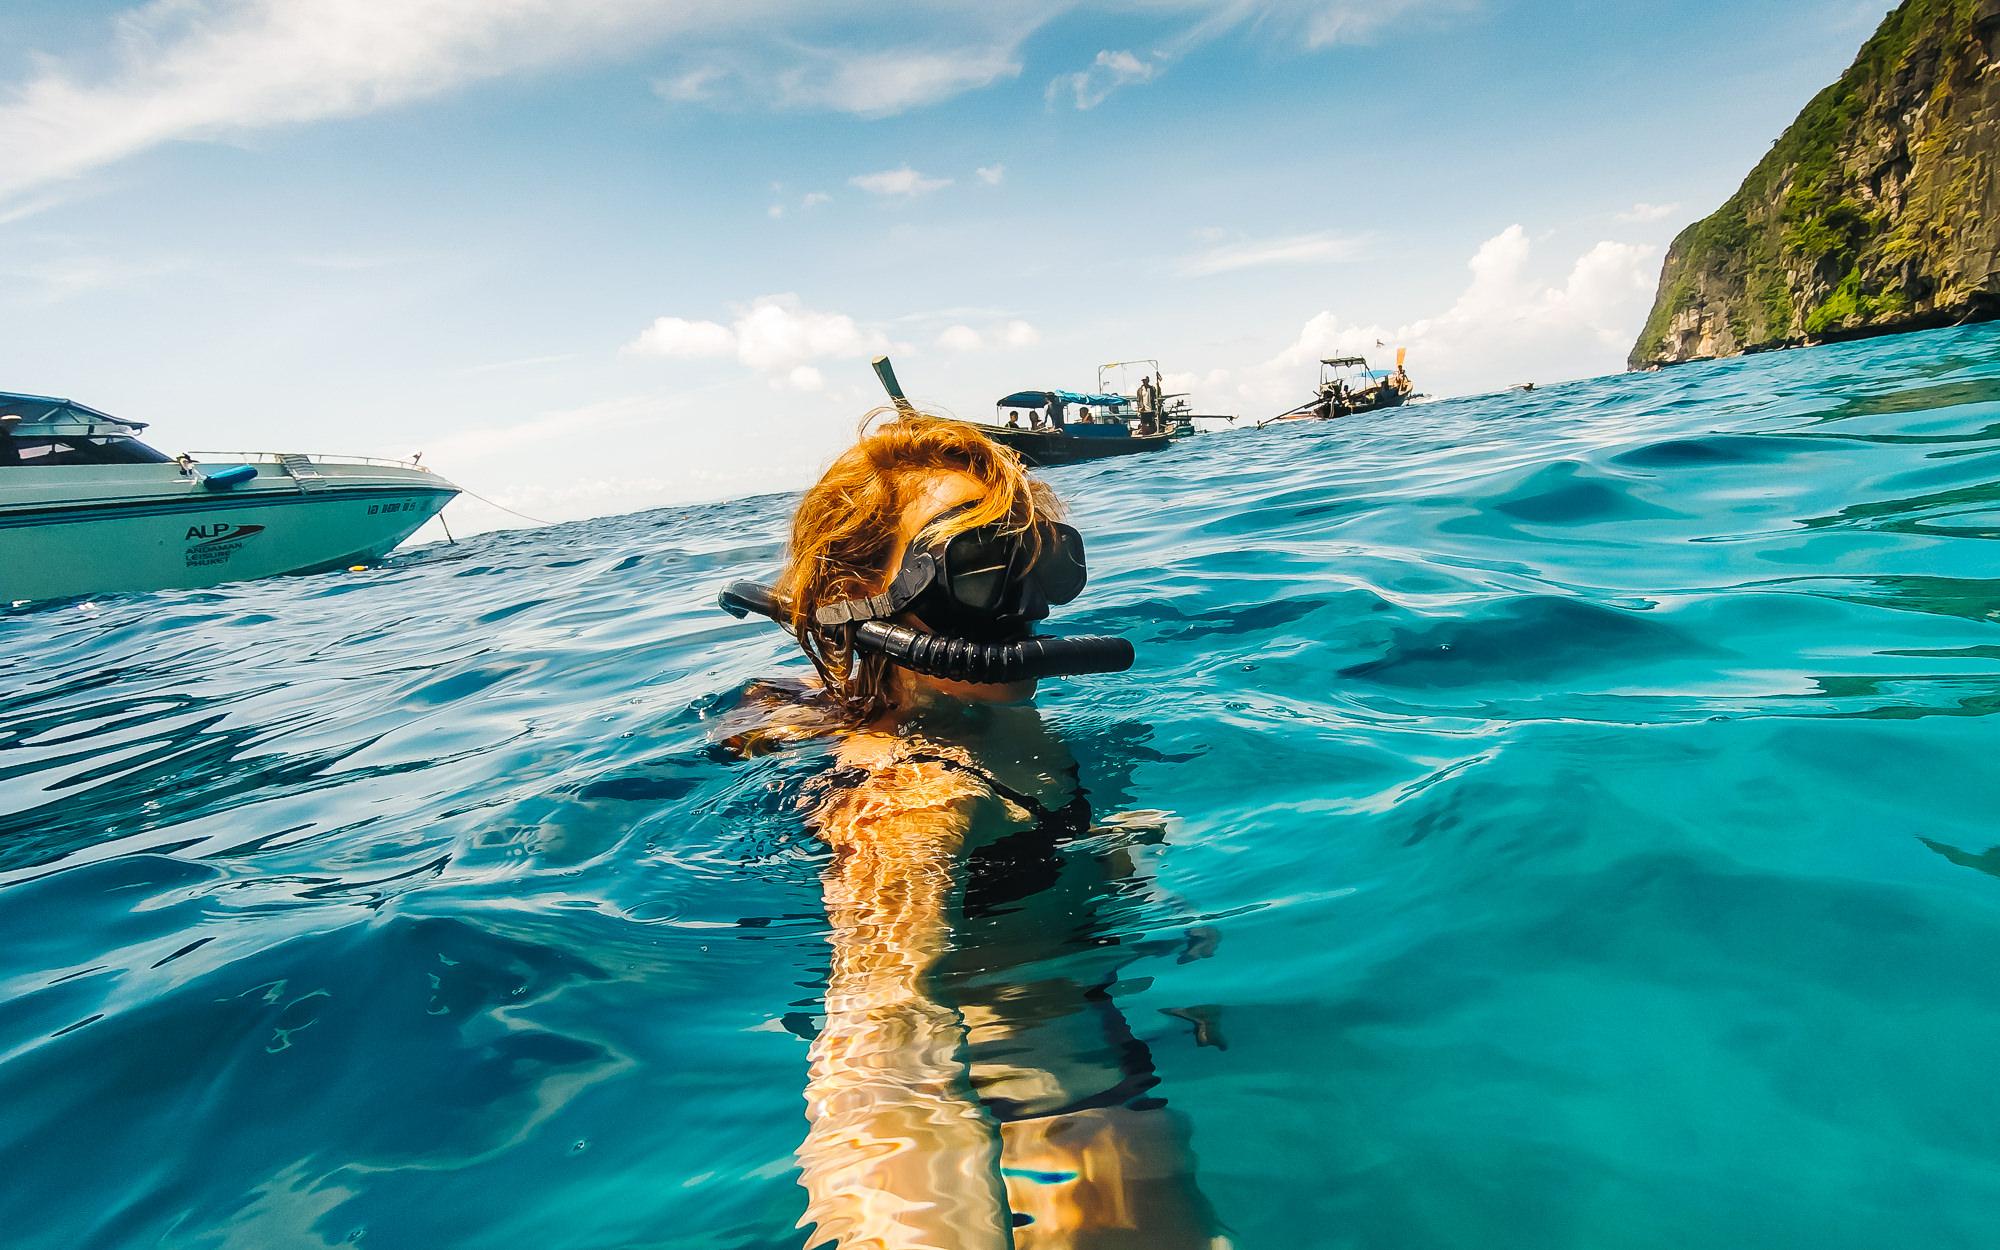 Struggling to snorkel